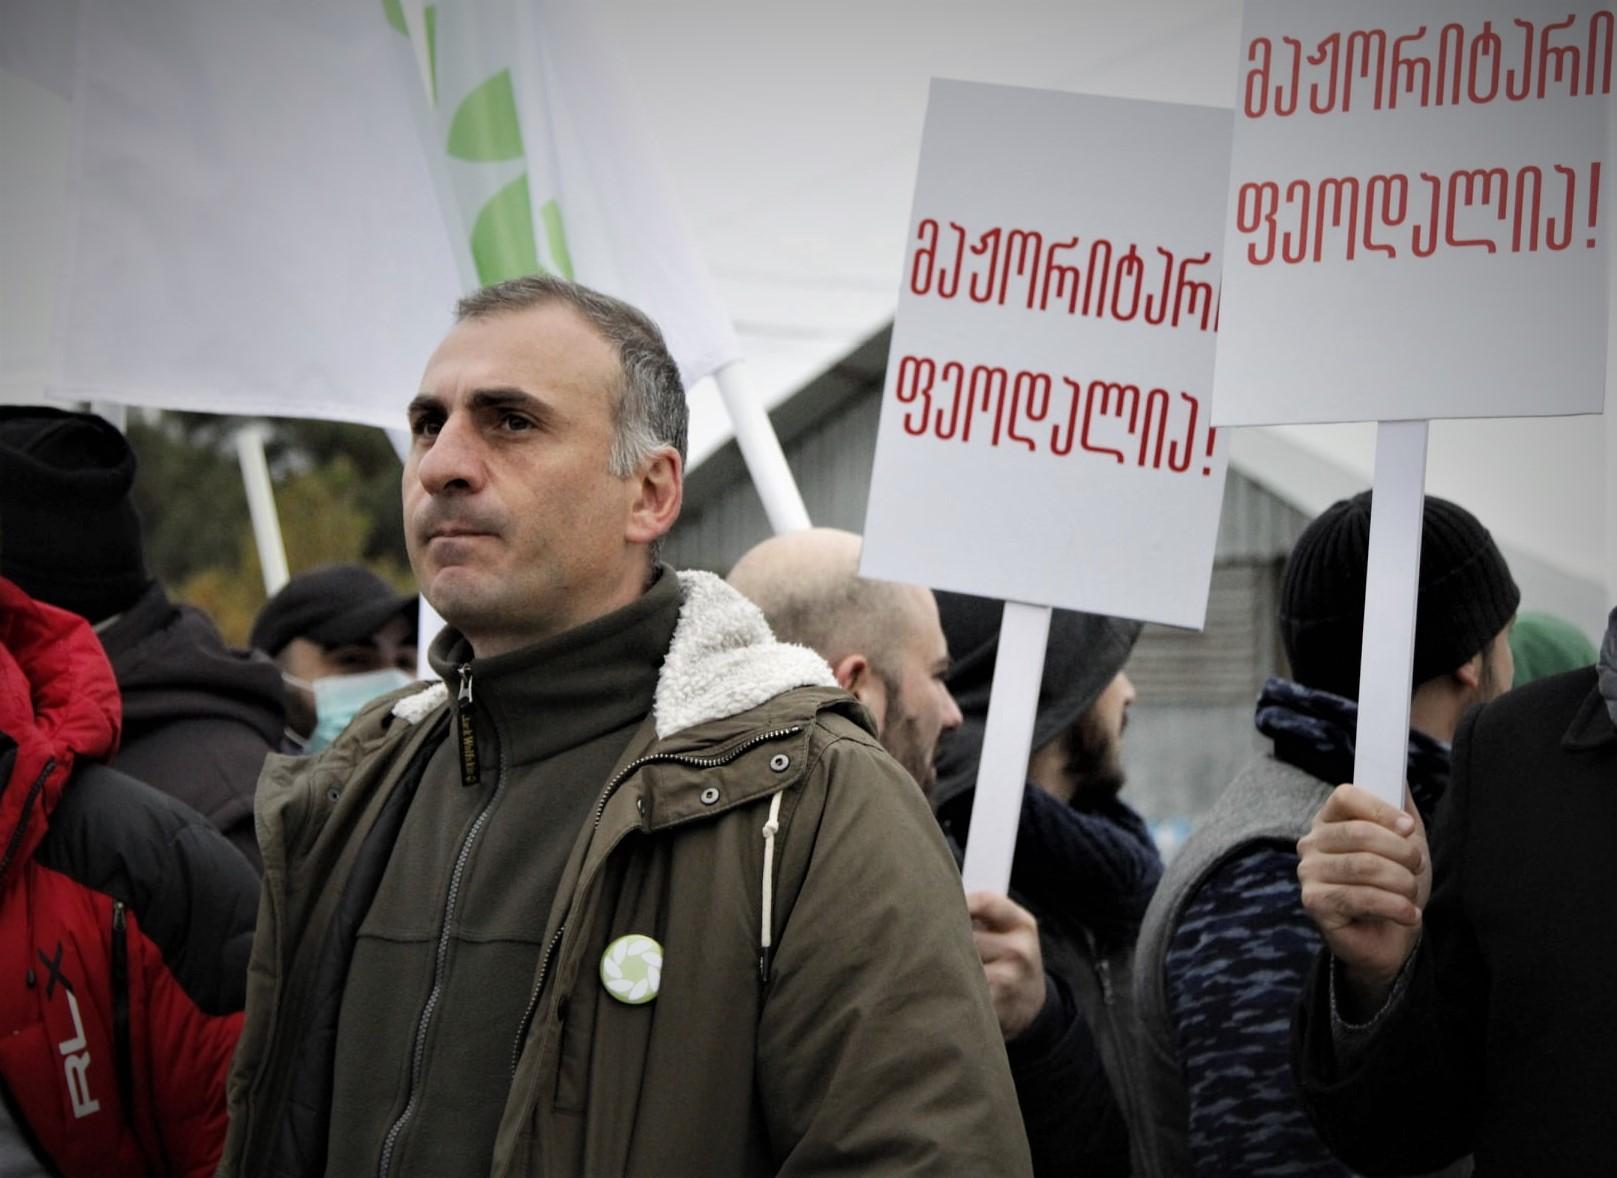 Aleko Elisashvili 43 Алеко Элисашвили Алеко Элисашвили